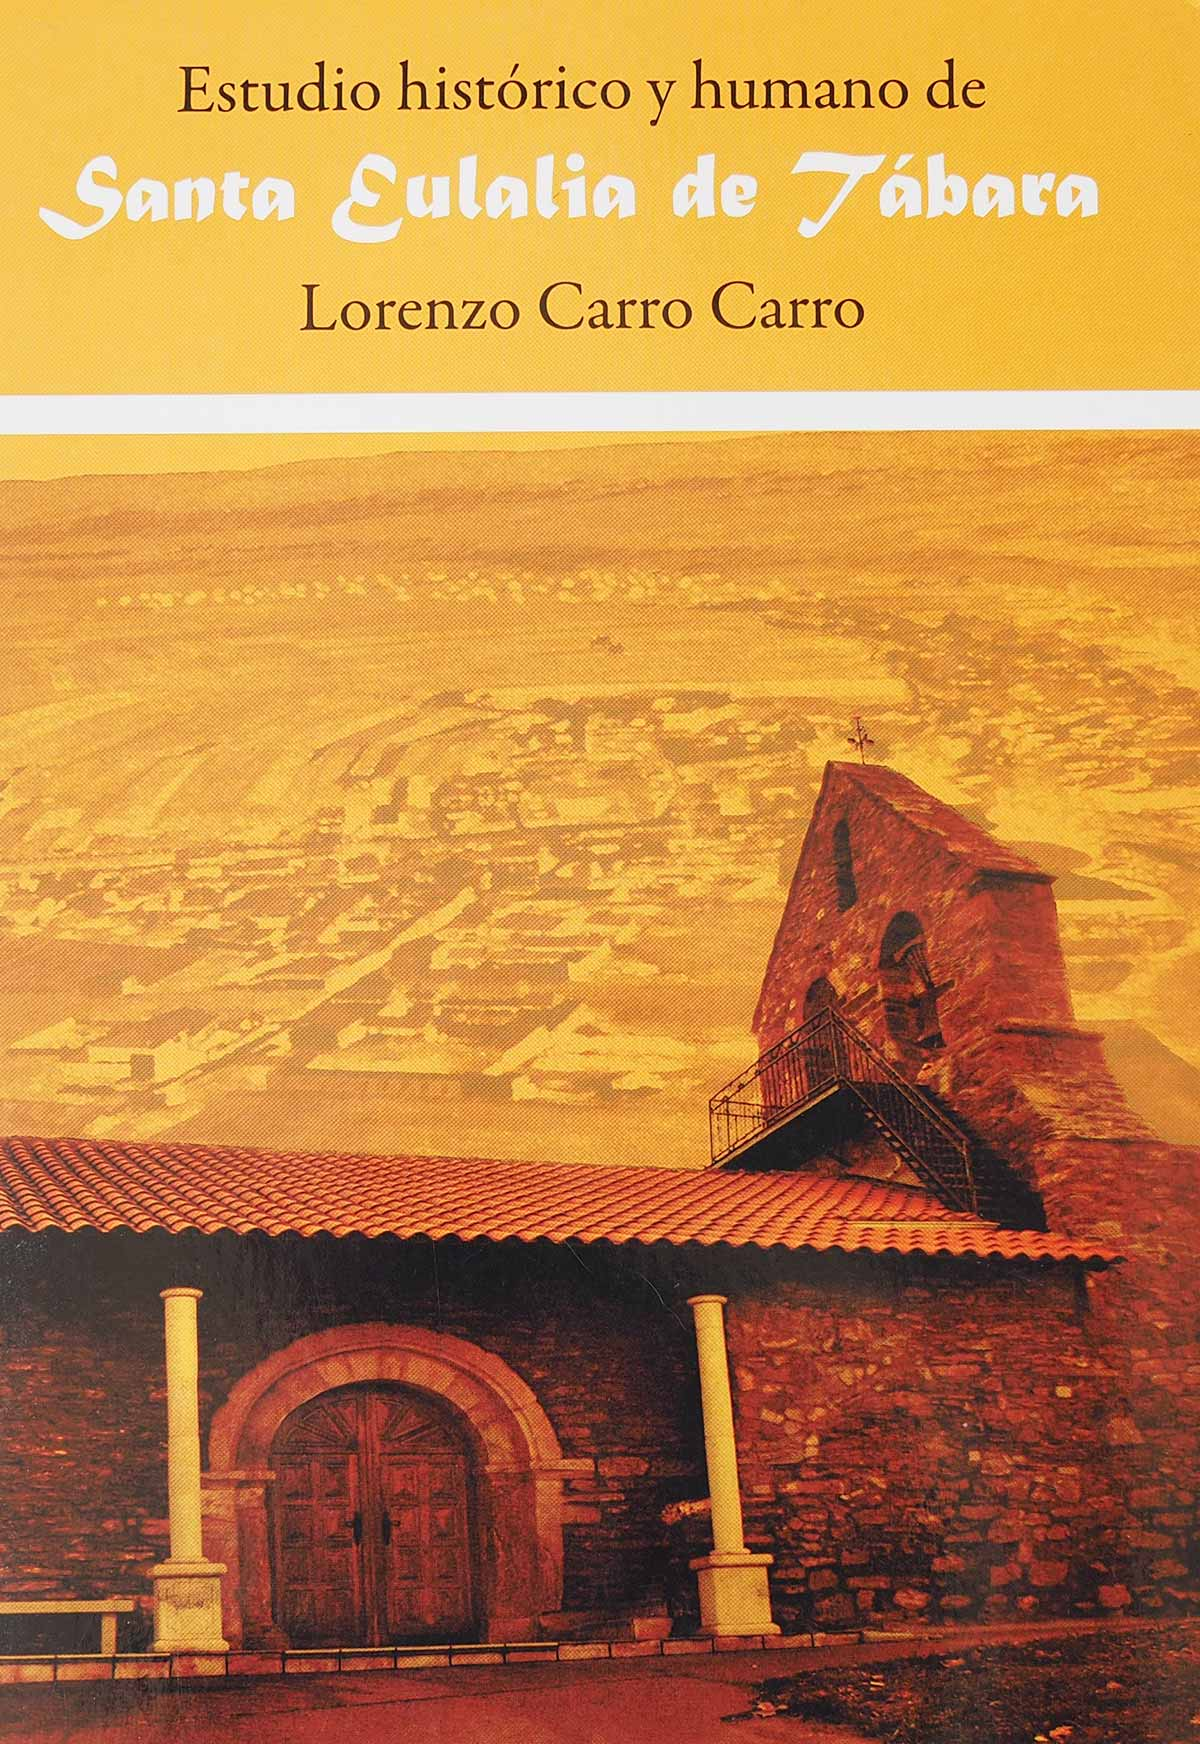 estudio-historico-humano-santa-eulalia-tabara-Lorenzo-carro-editorial-semuret